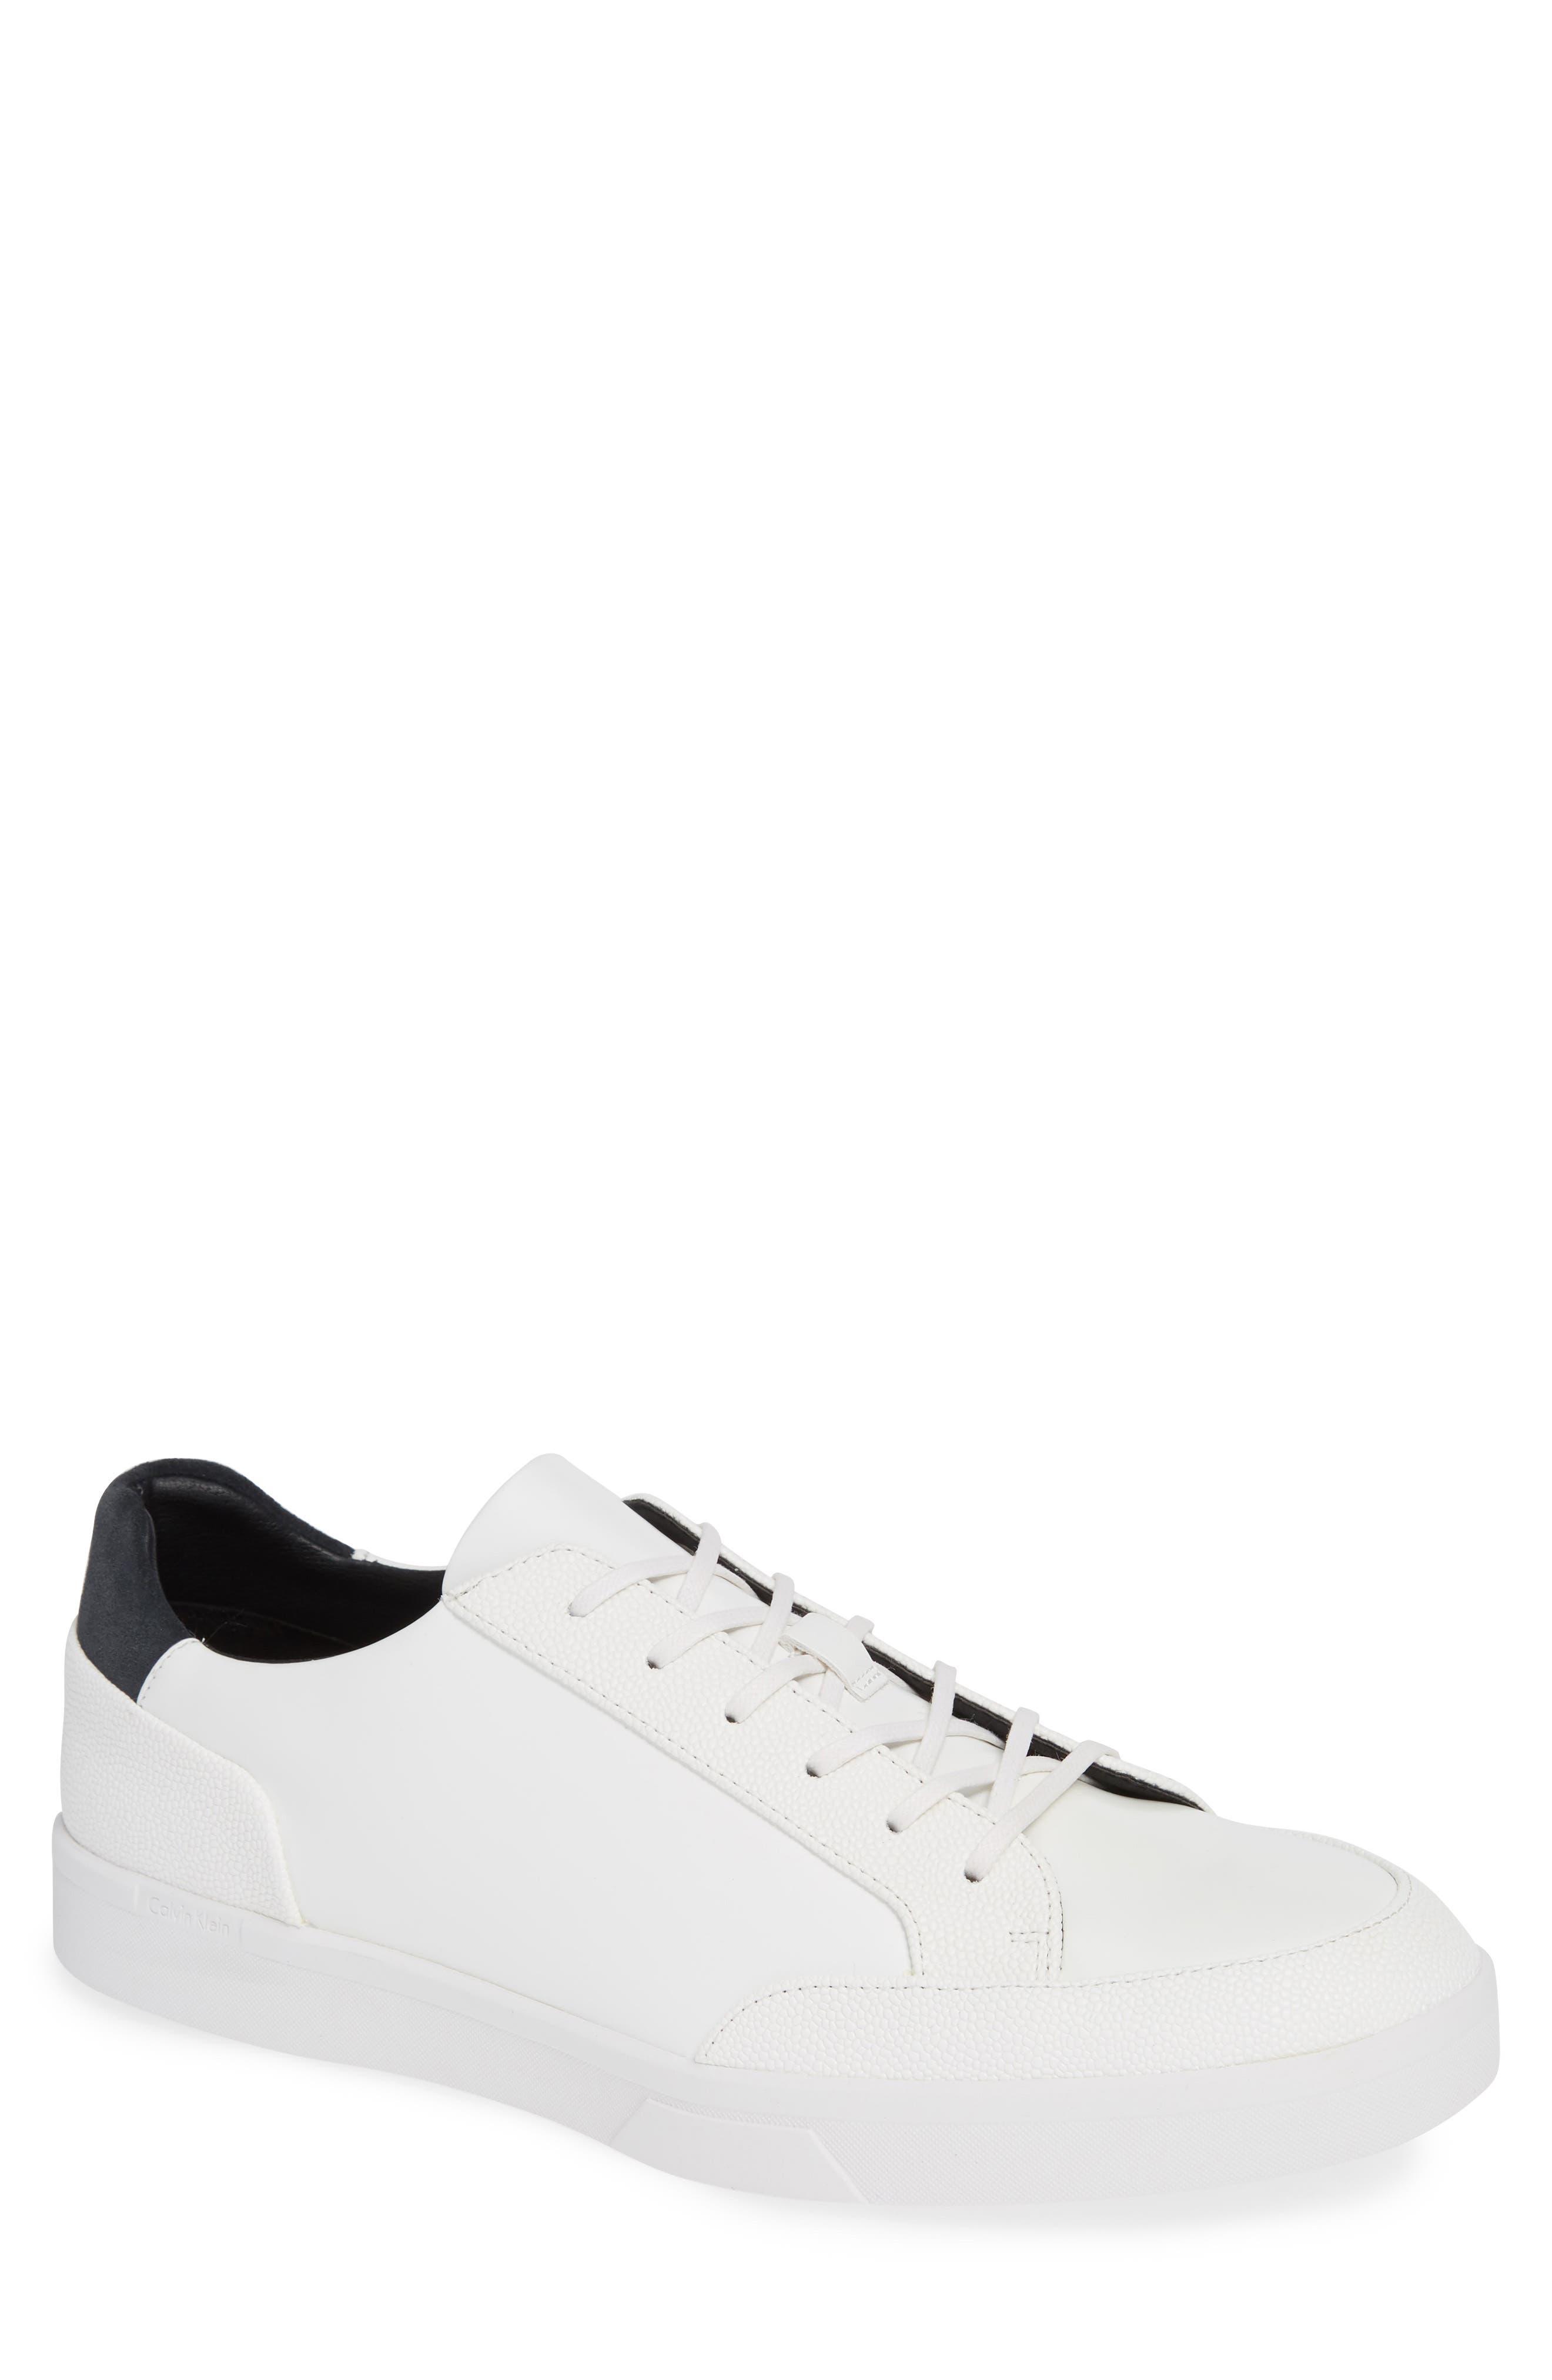 Izar Sneaker,                         Main,                         color, WHITE LEATHER